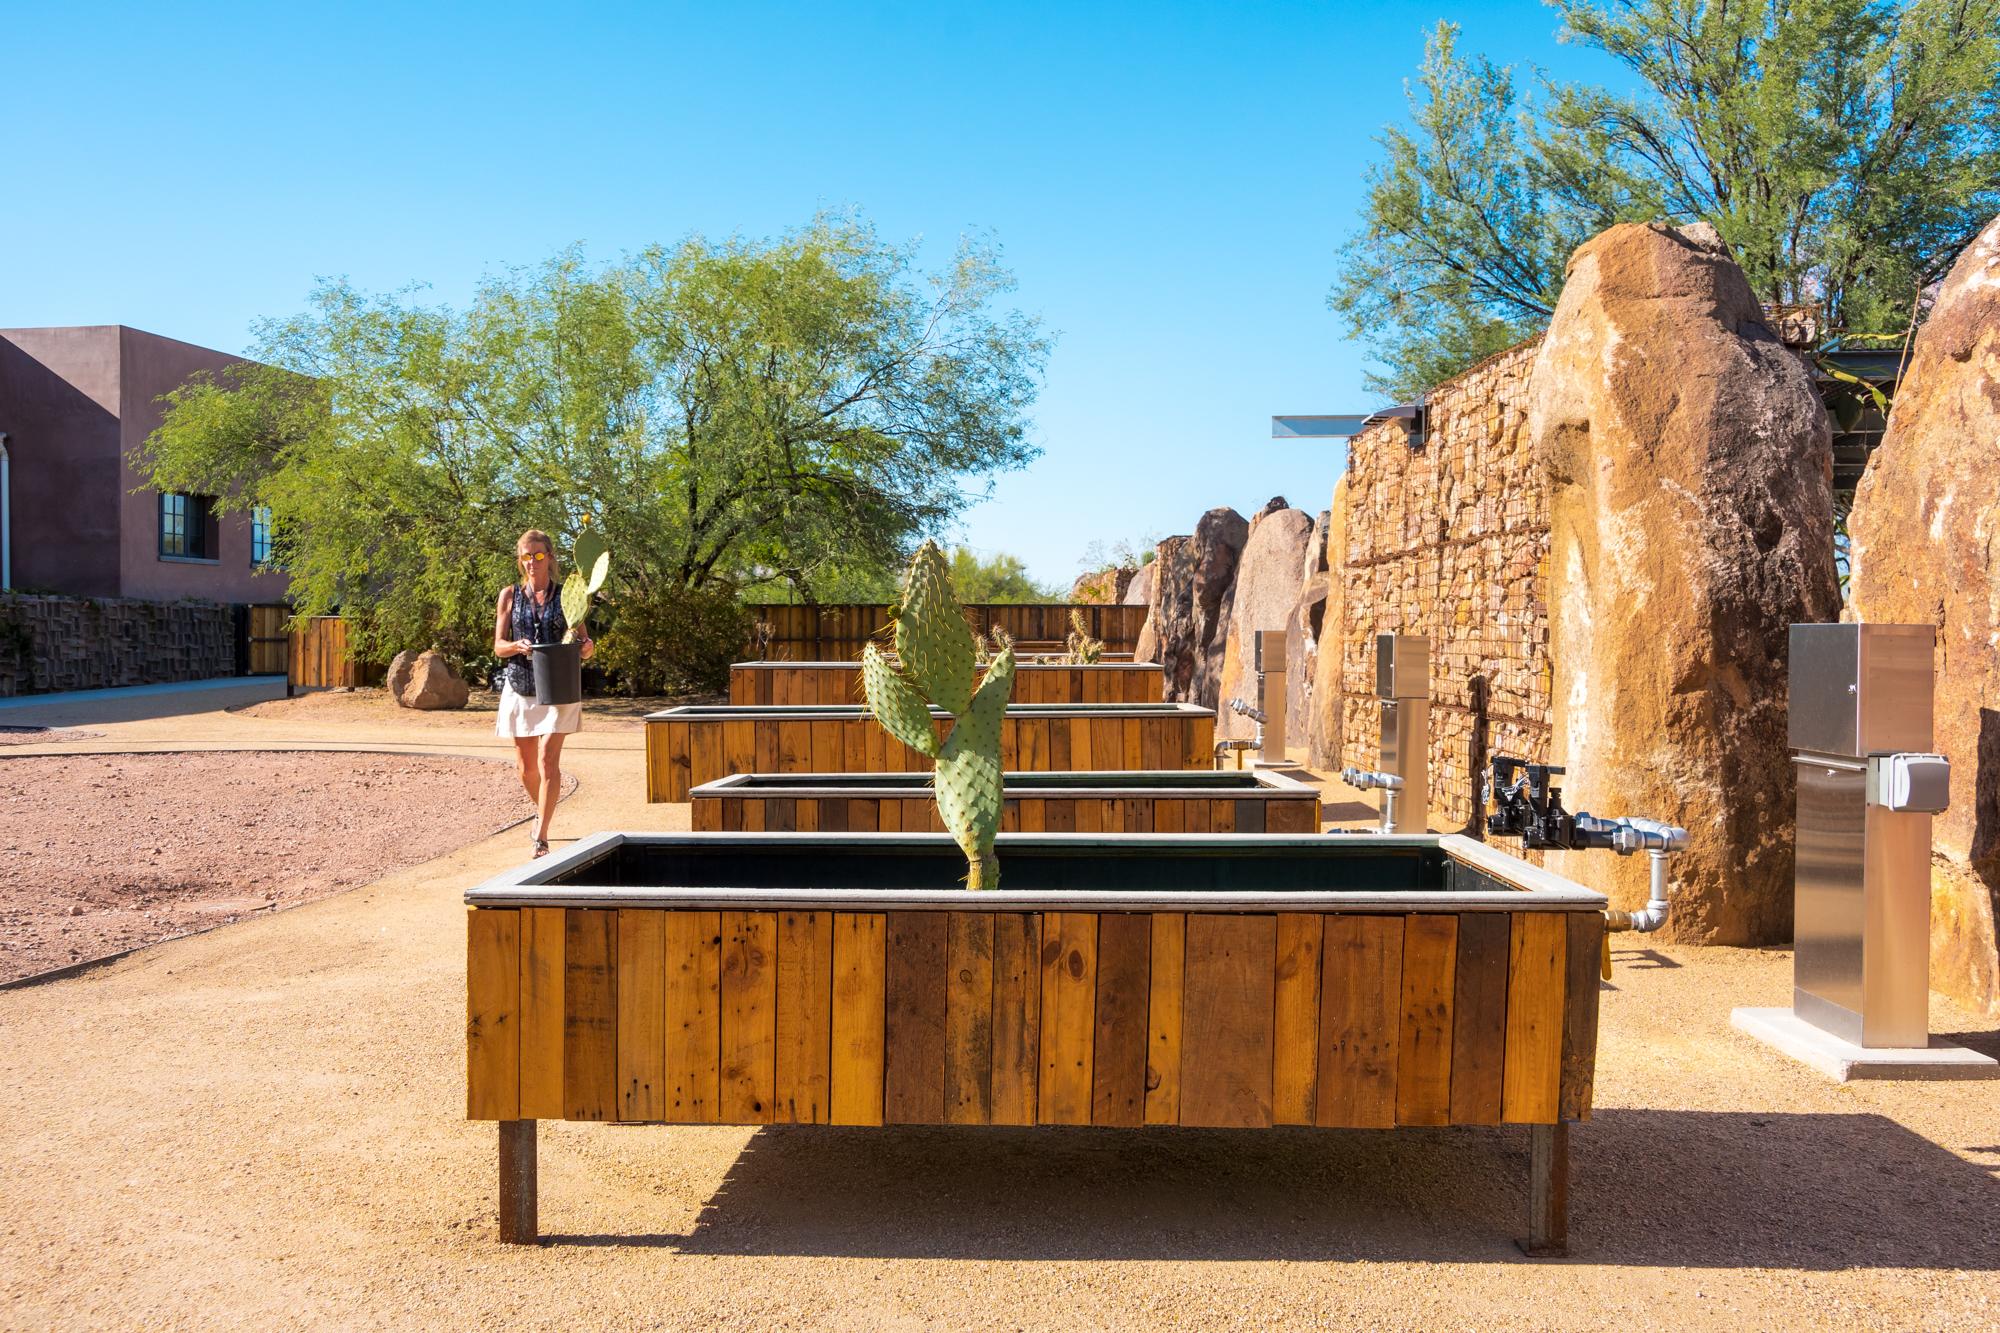 Desert Botanical Garden_An Pham Photography_ArchitectureDesert Botanical Garden_Architecture_An Pham_photography_AN5_7424.jpg